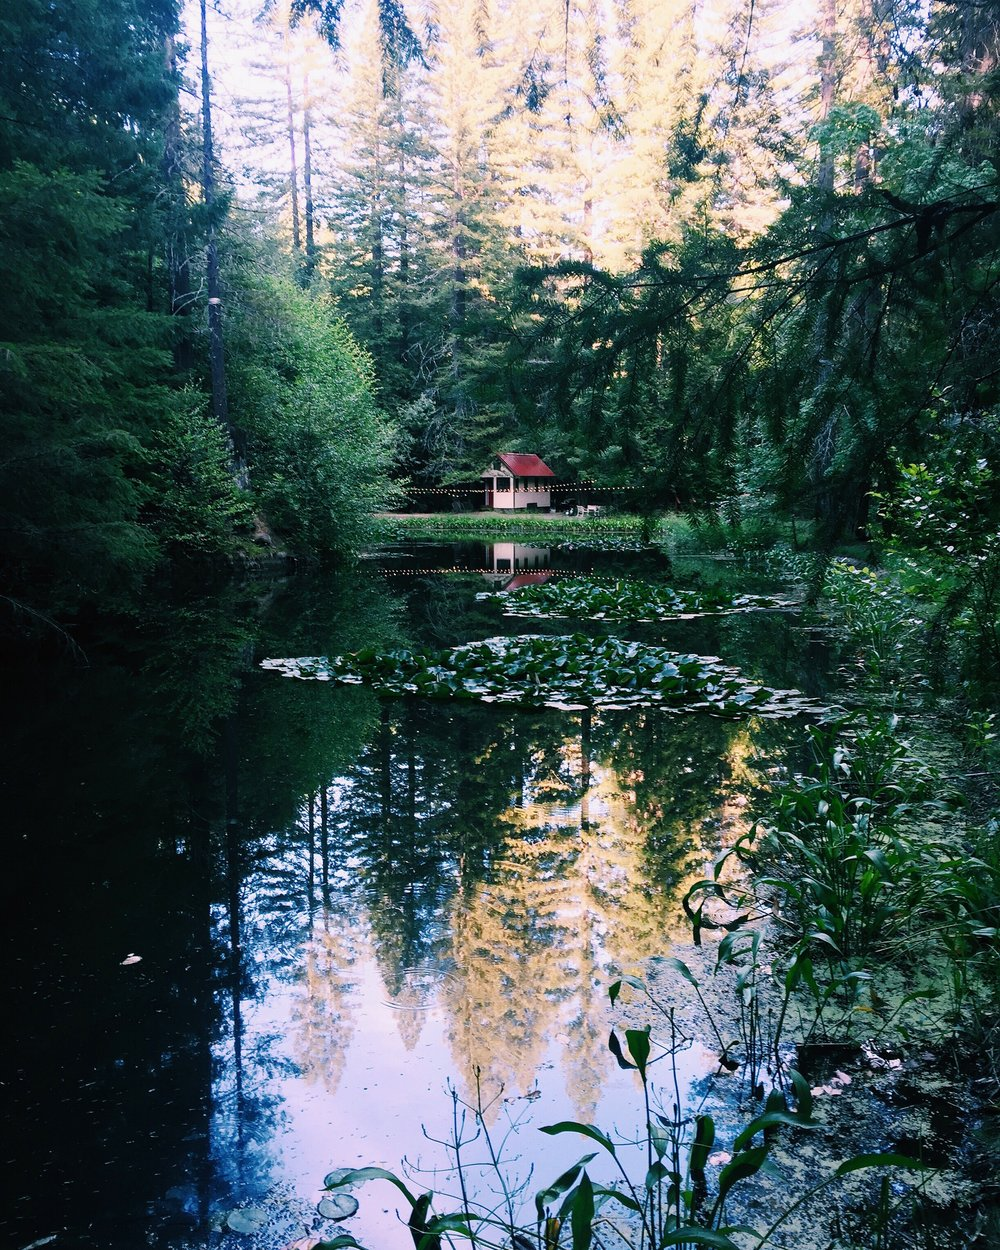 Cabin-in-the-woods.jpg